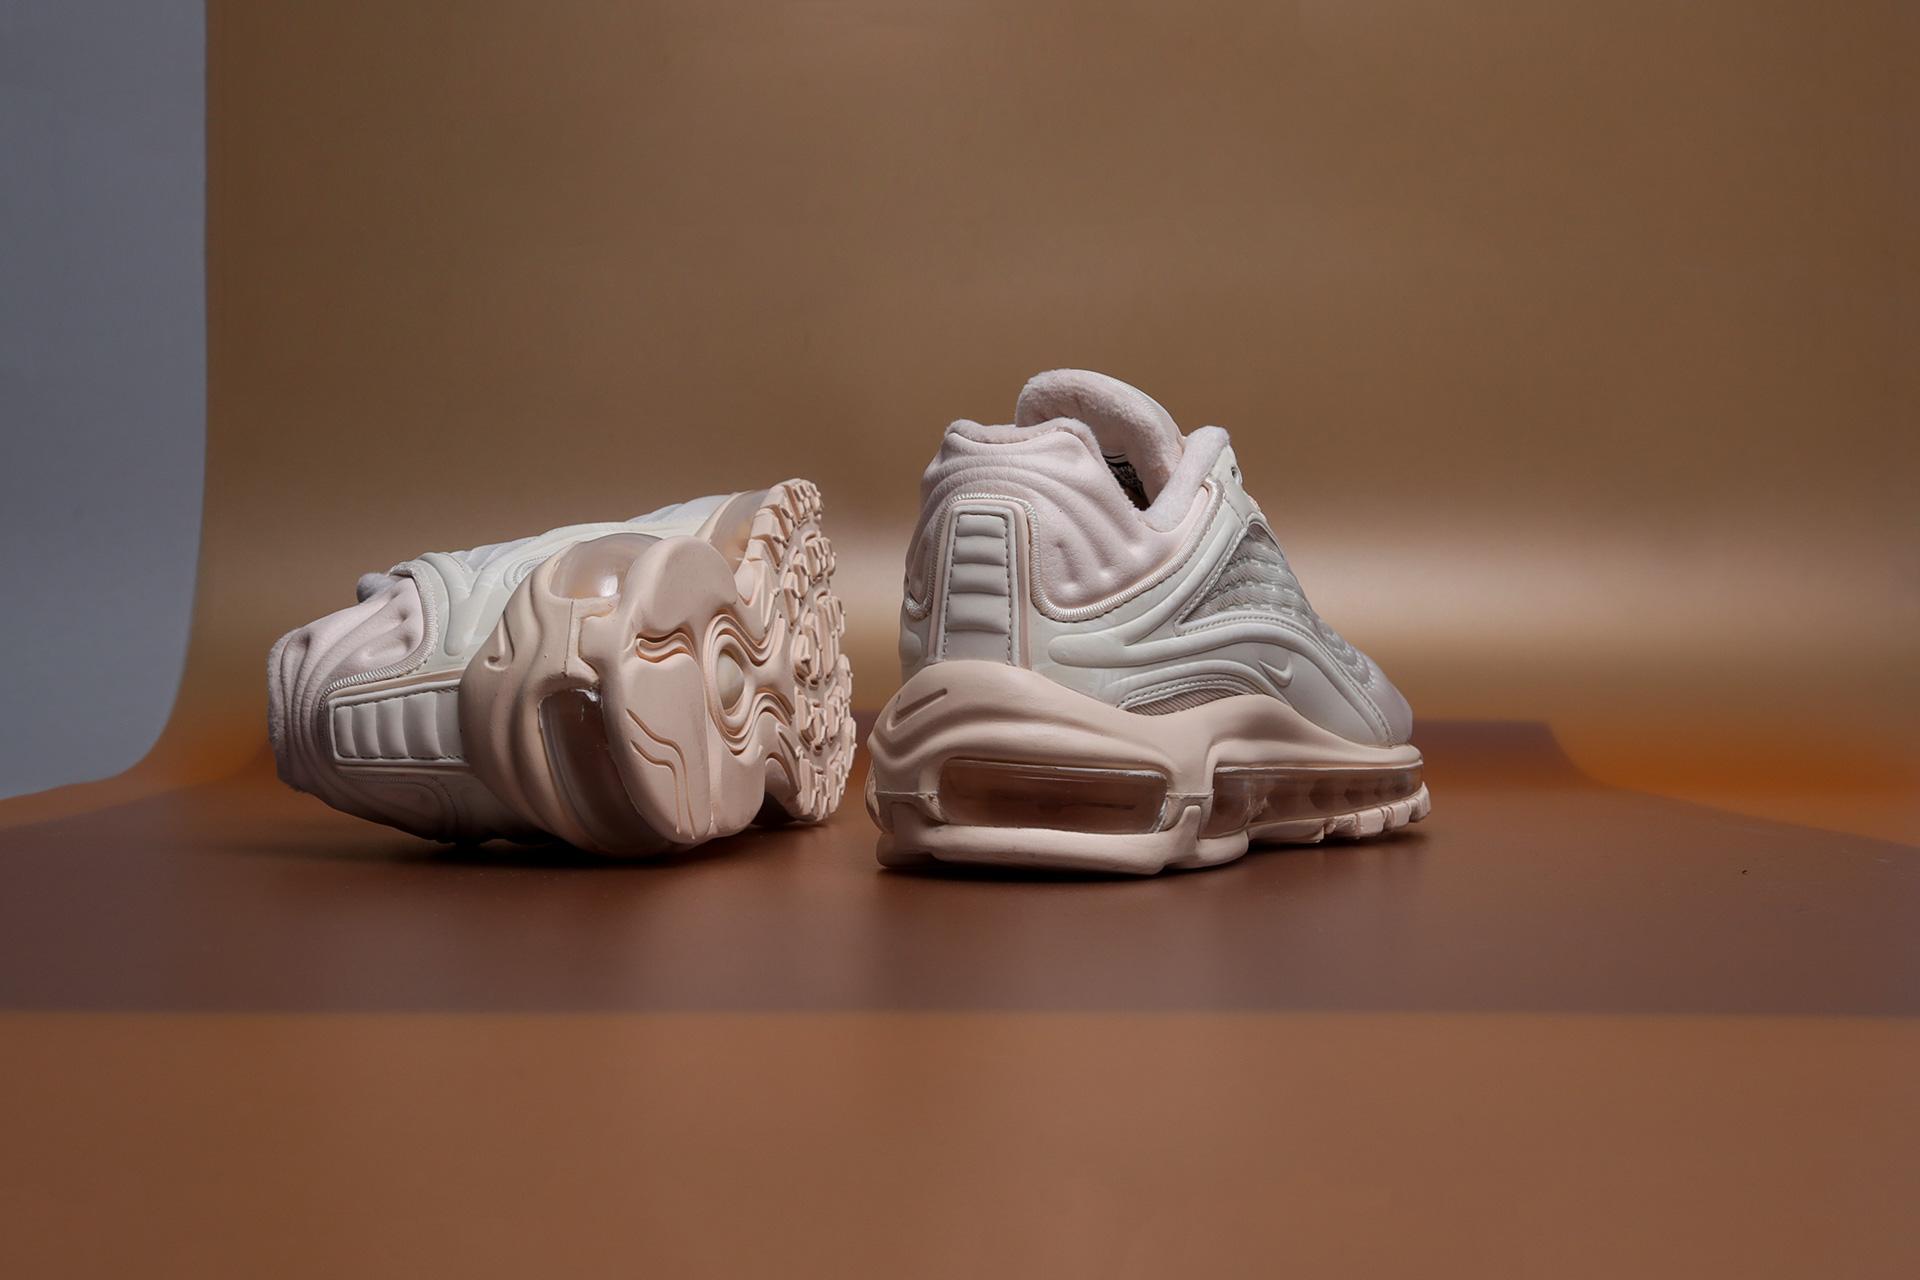 fd66aeb8 ... Купить женские бежевые кроссовки Nike Air Max Deluxe SE - фото 4  картинки ...